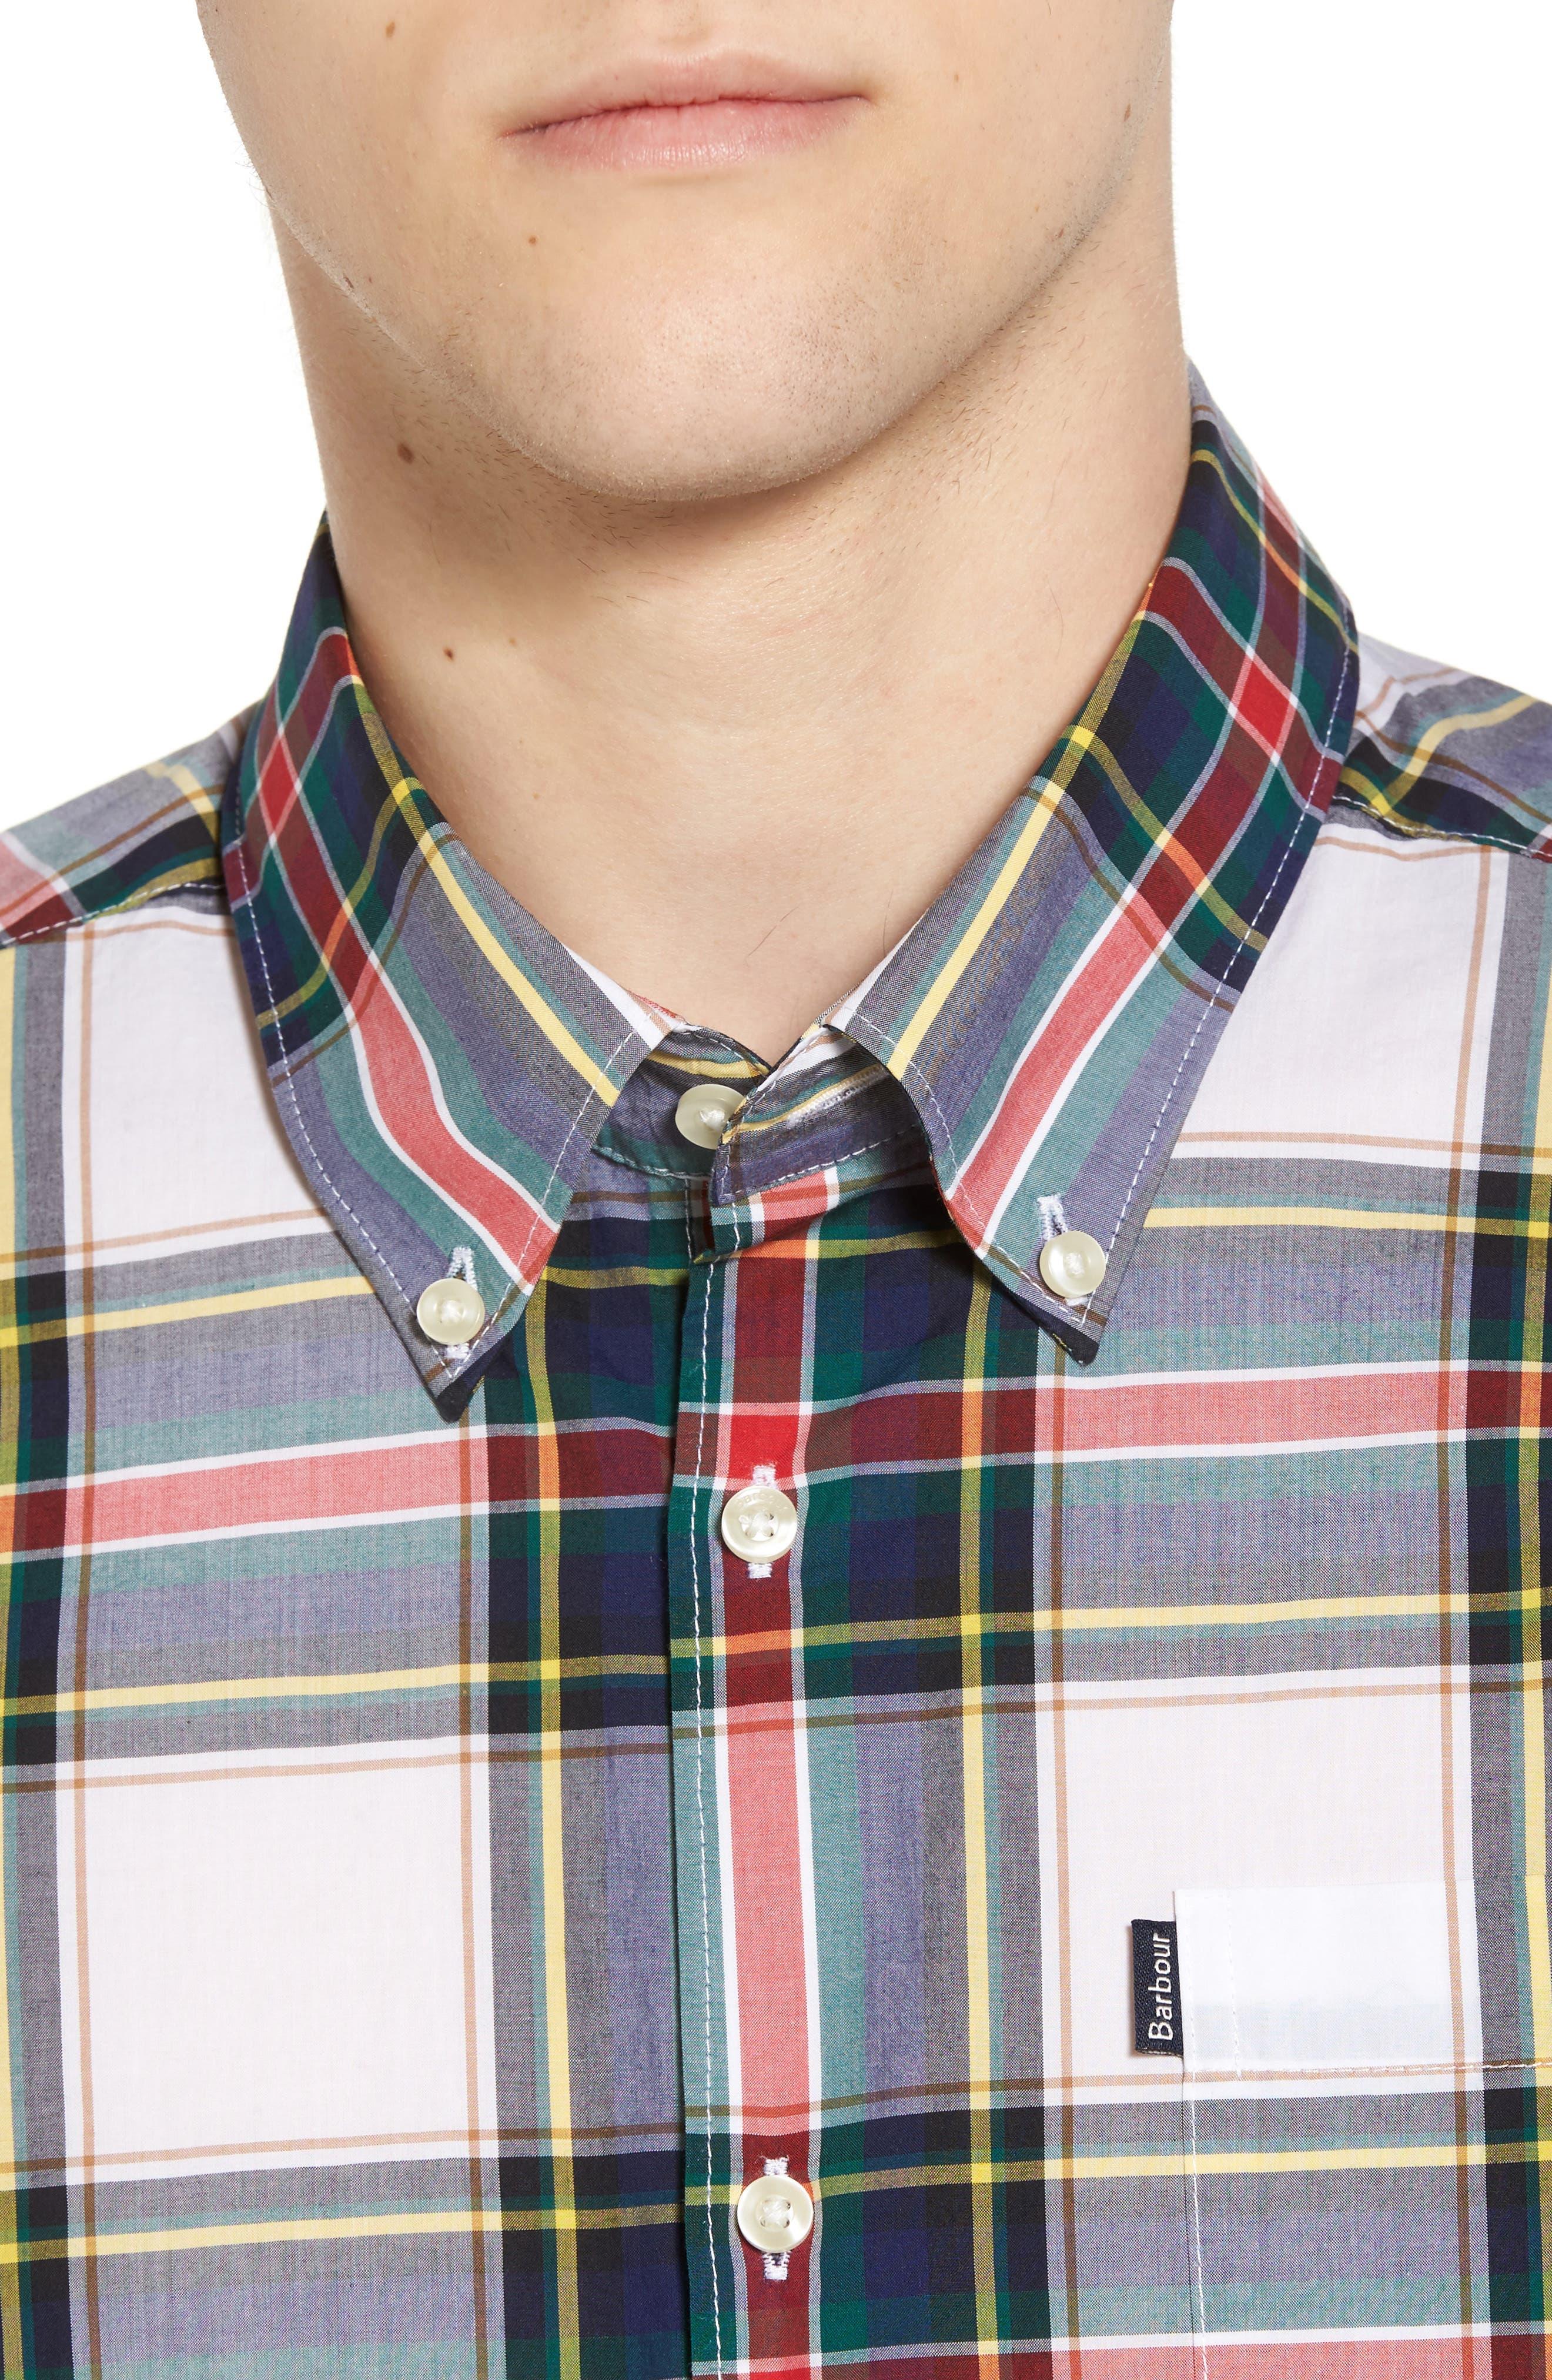 Oscar Trim Fit Plaid Sport Shirt,                             Alternate thumbnail 4, color,                             White